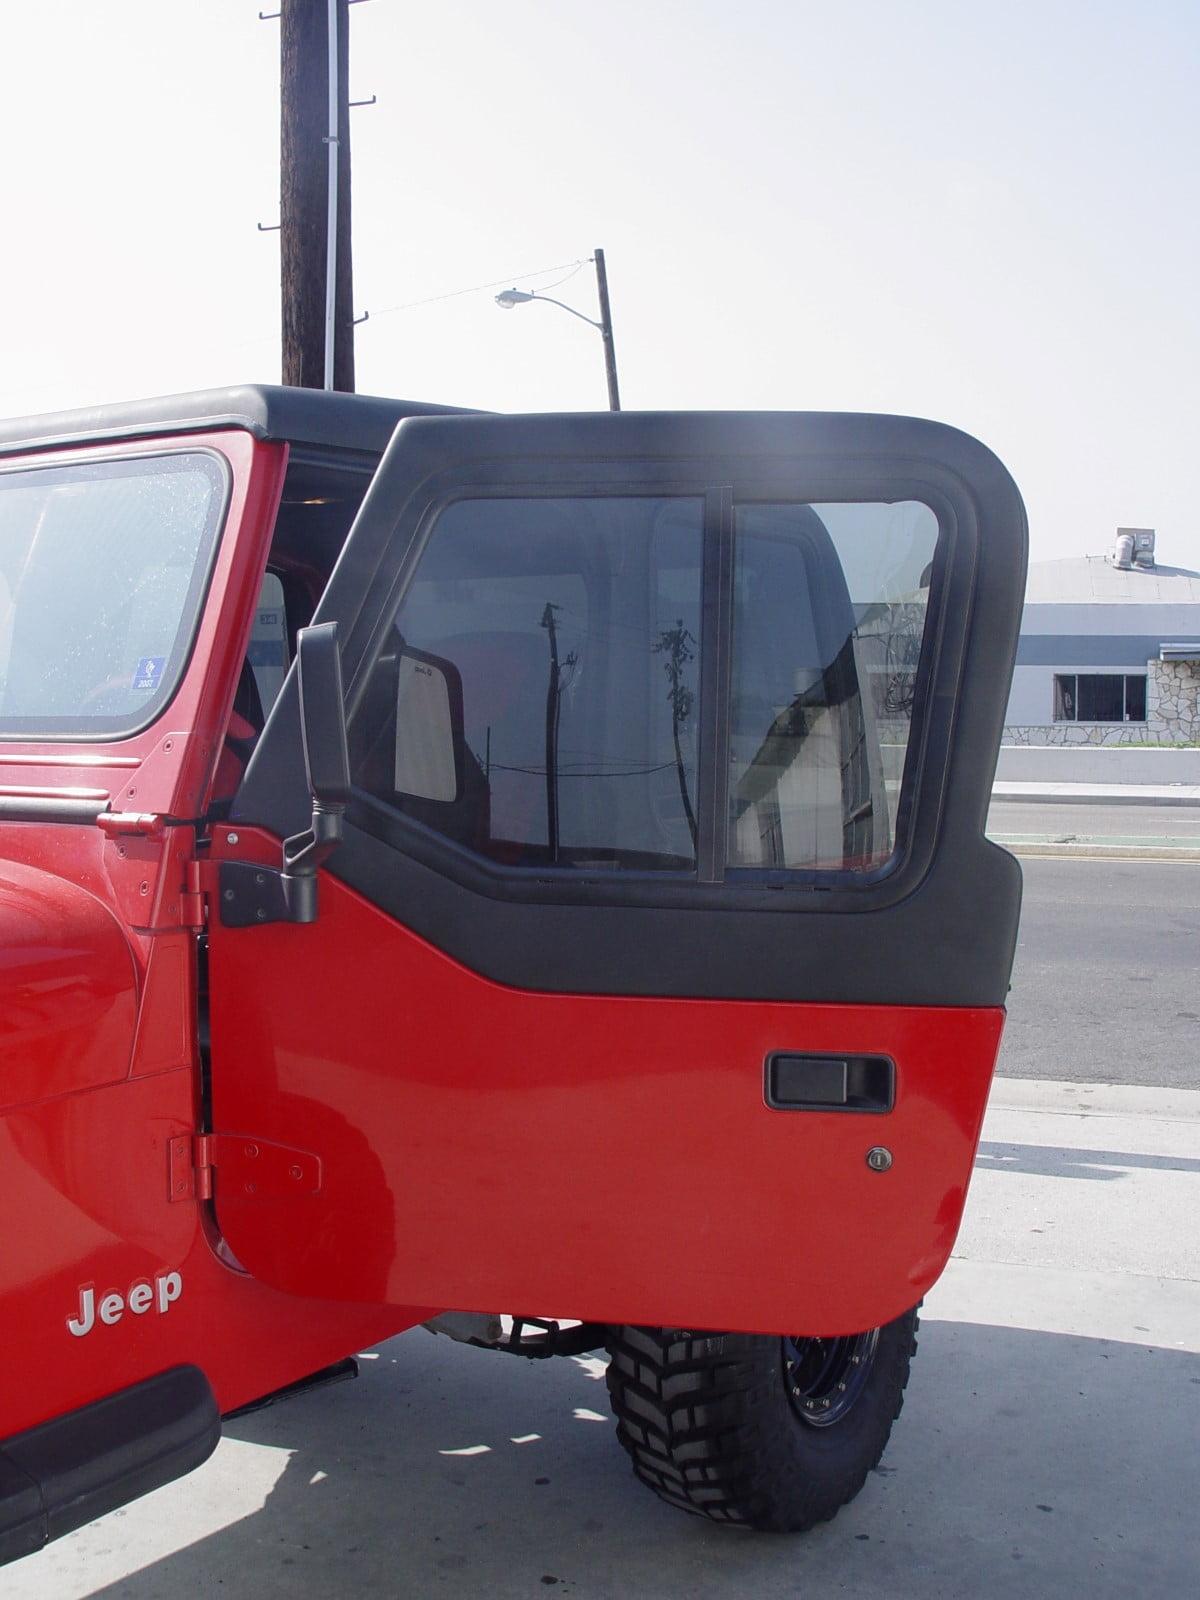 1998 Jeep Wrangler Soft Top : wrangler, Doors, Wrangler, Convert, Fiberglass, Jeeps